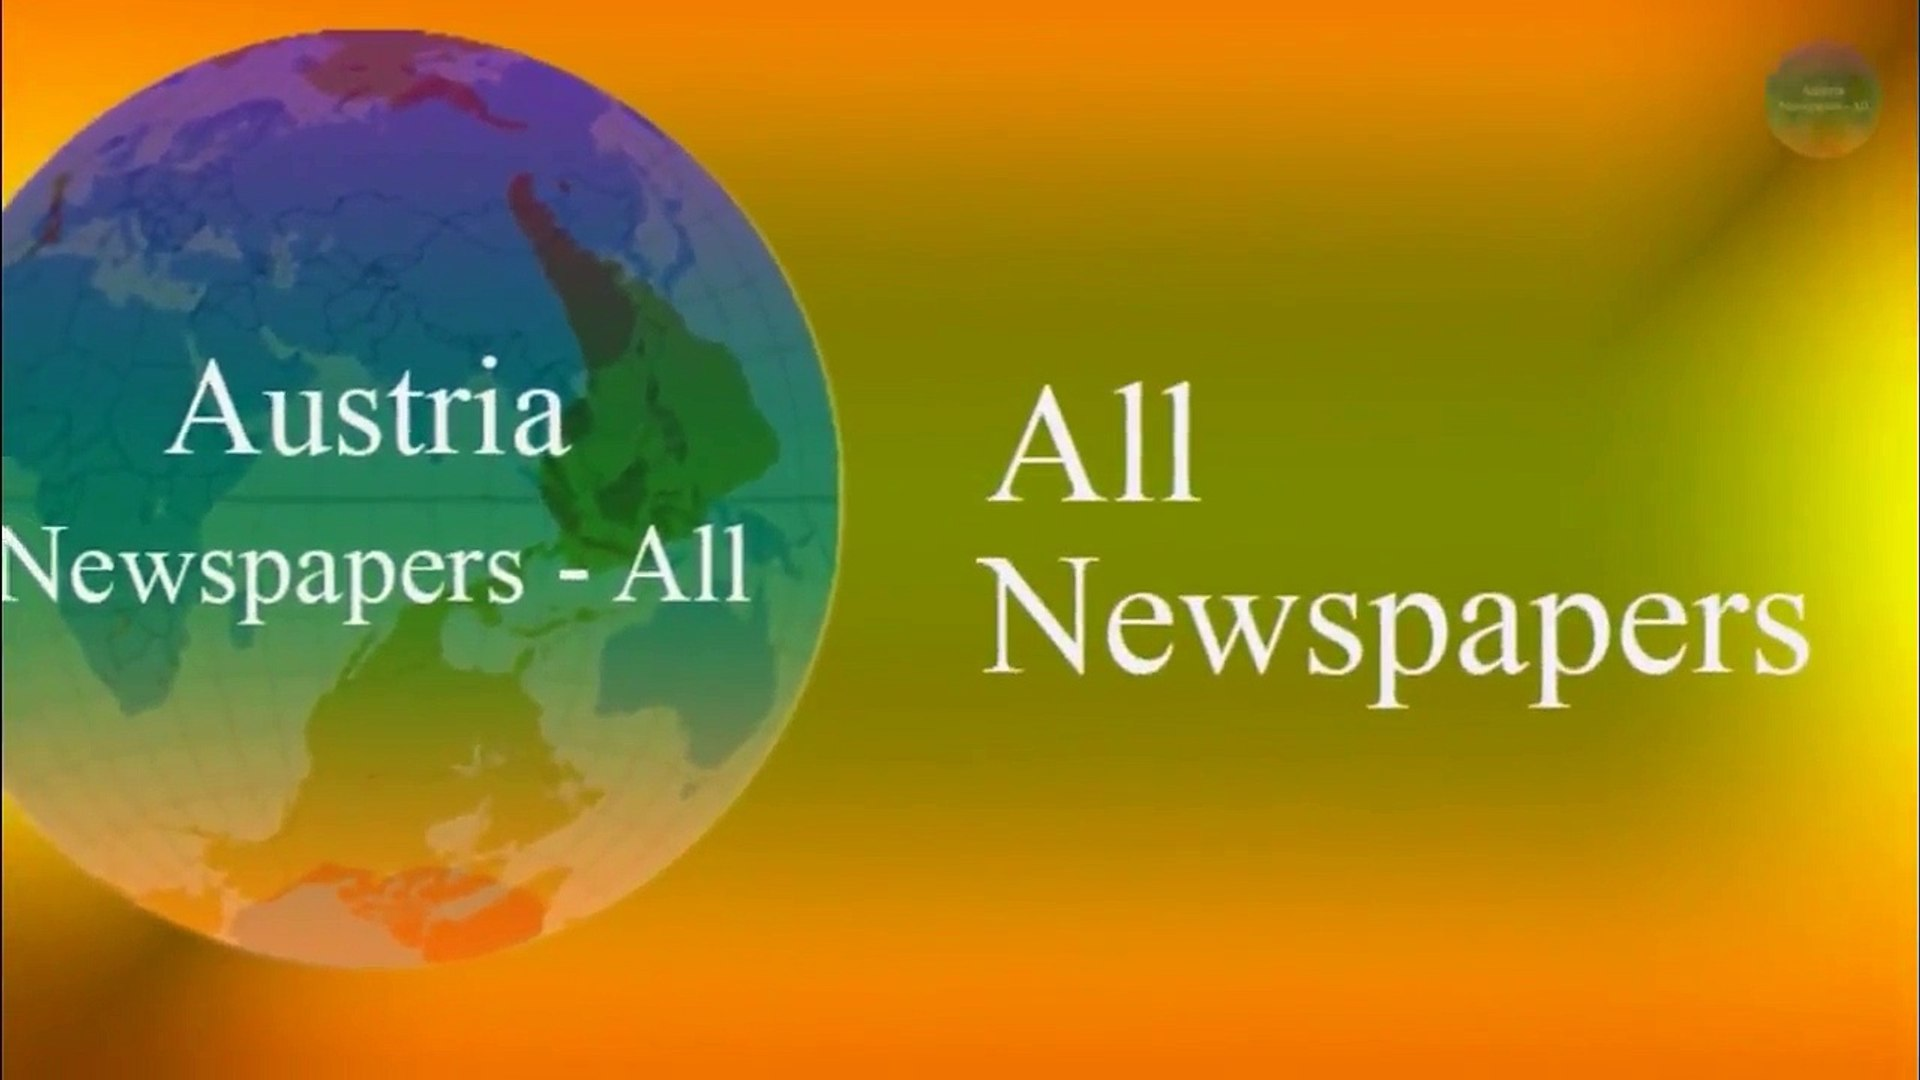 Austria Newspapers - Austria News - Top Austria Newspapers App - Austria news live - YouTube